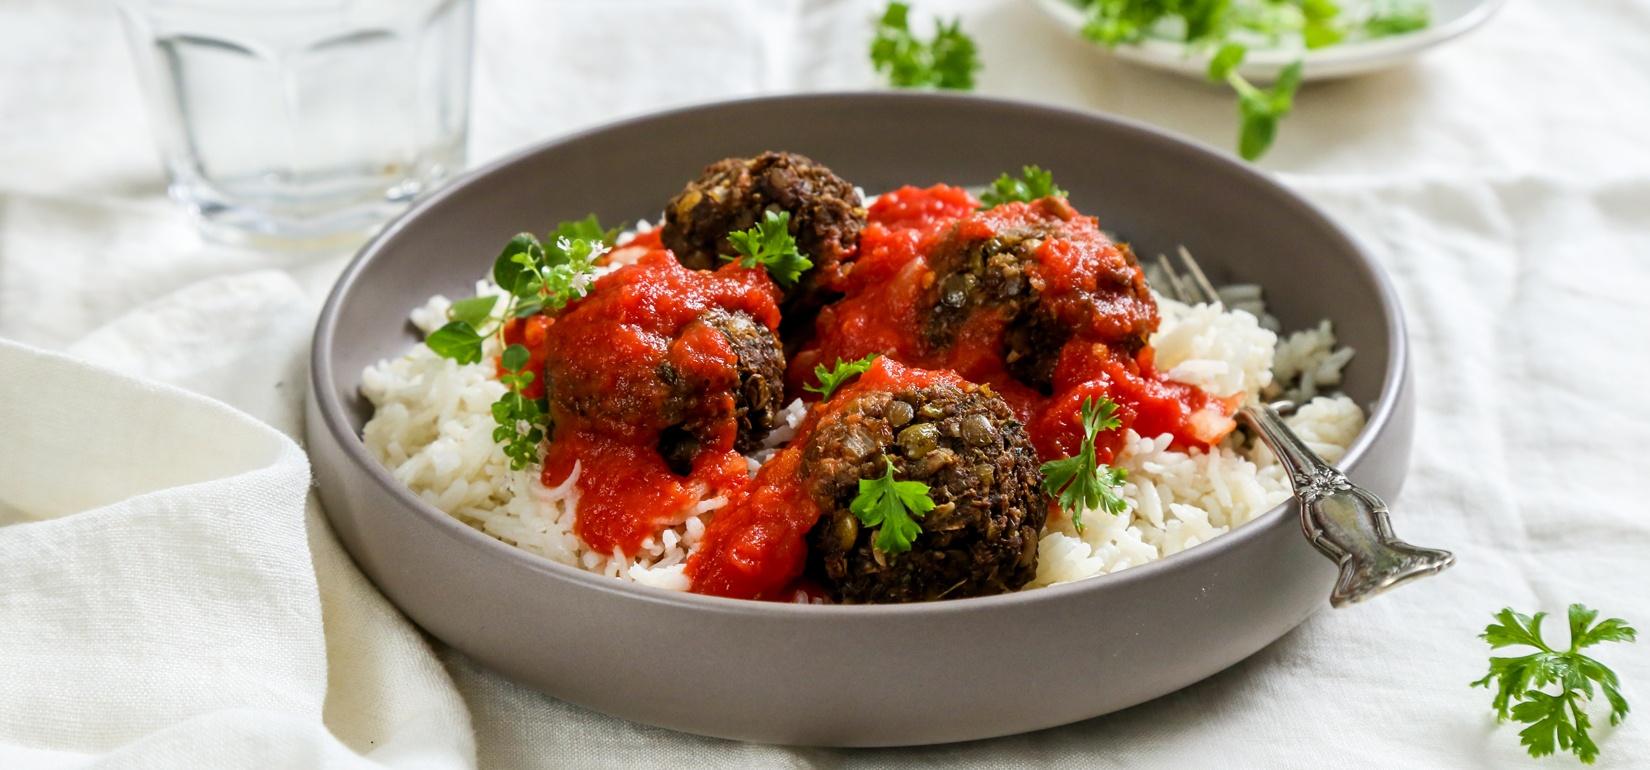 - Organic vegan meatballsItems we carry for this dish: Paprika, virgin olive oil, parsley, oregano, tomato sauce, sea salt, garbanzo beans